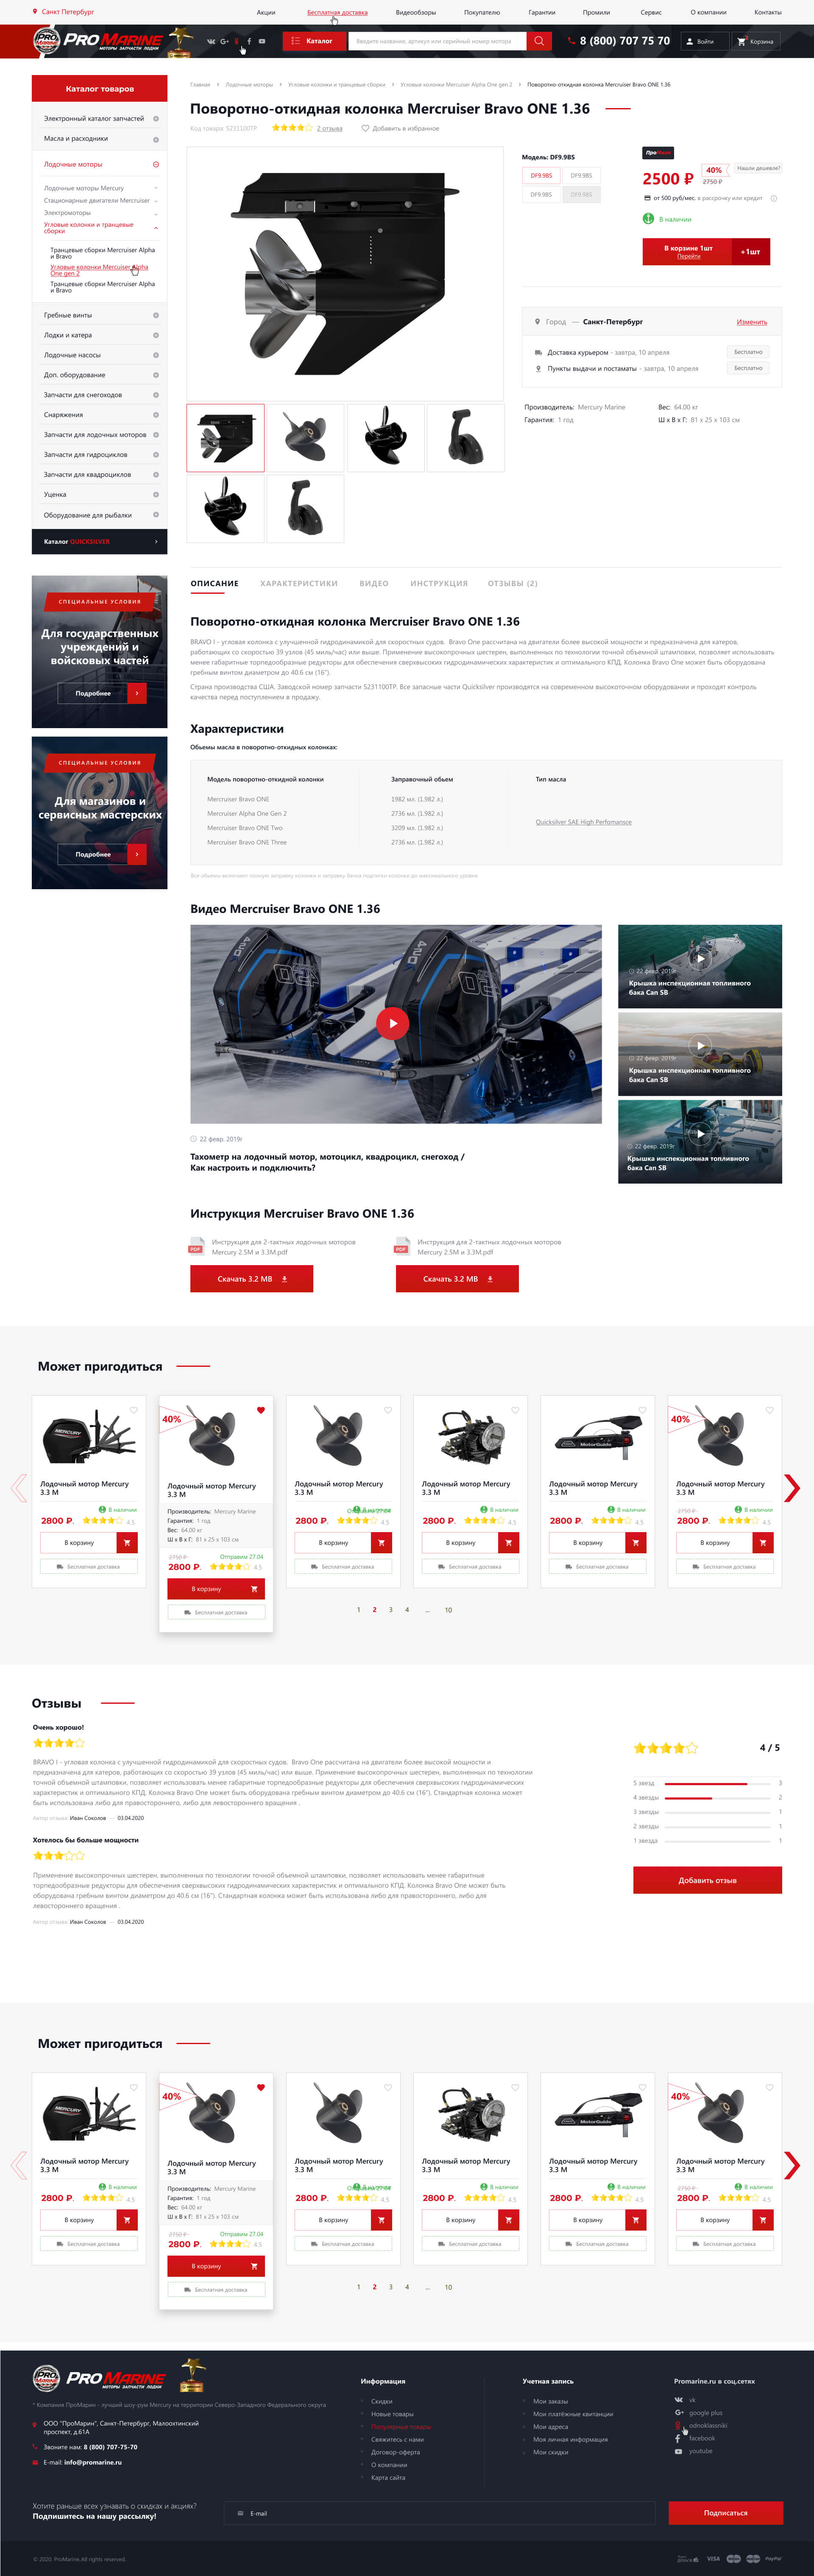 Promarine_06_Product Page_1.0